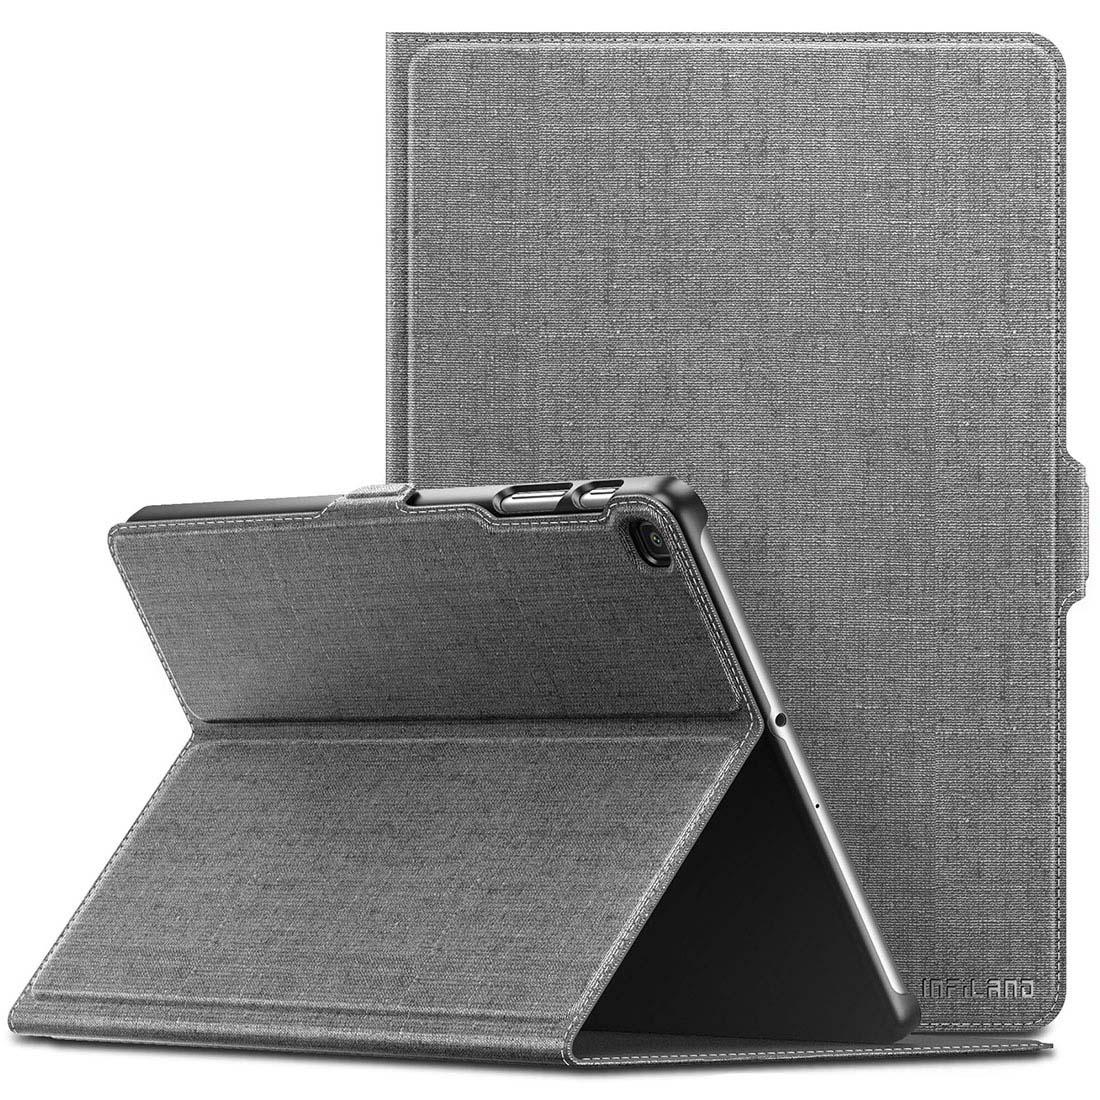 Capa Premium Classic Series Com Fino Acabamento Para Samsung Galaxy Tab A 10.1 (2019) T510 T515